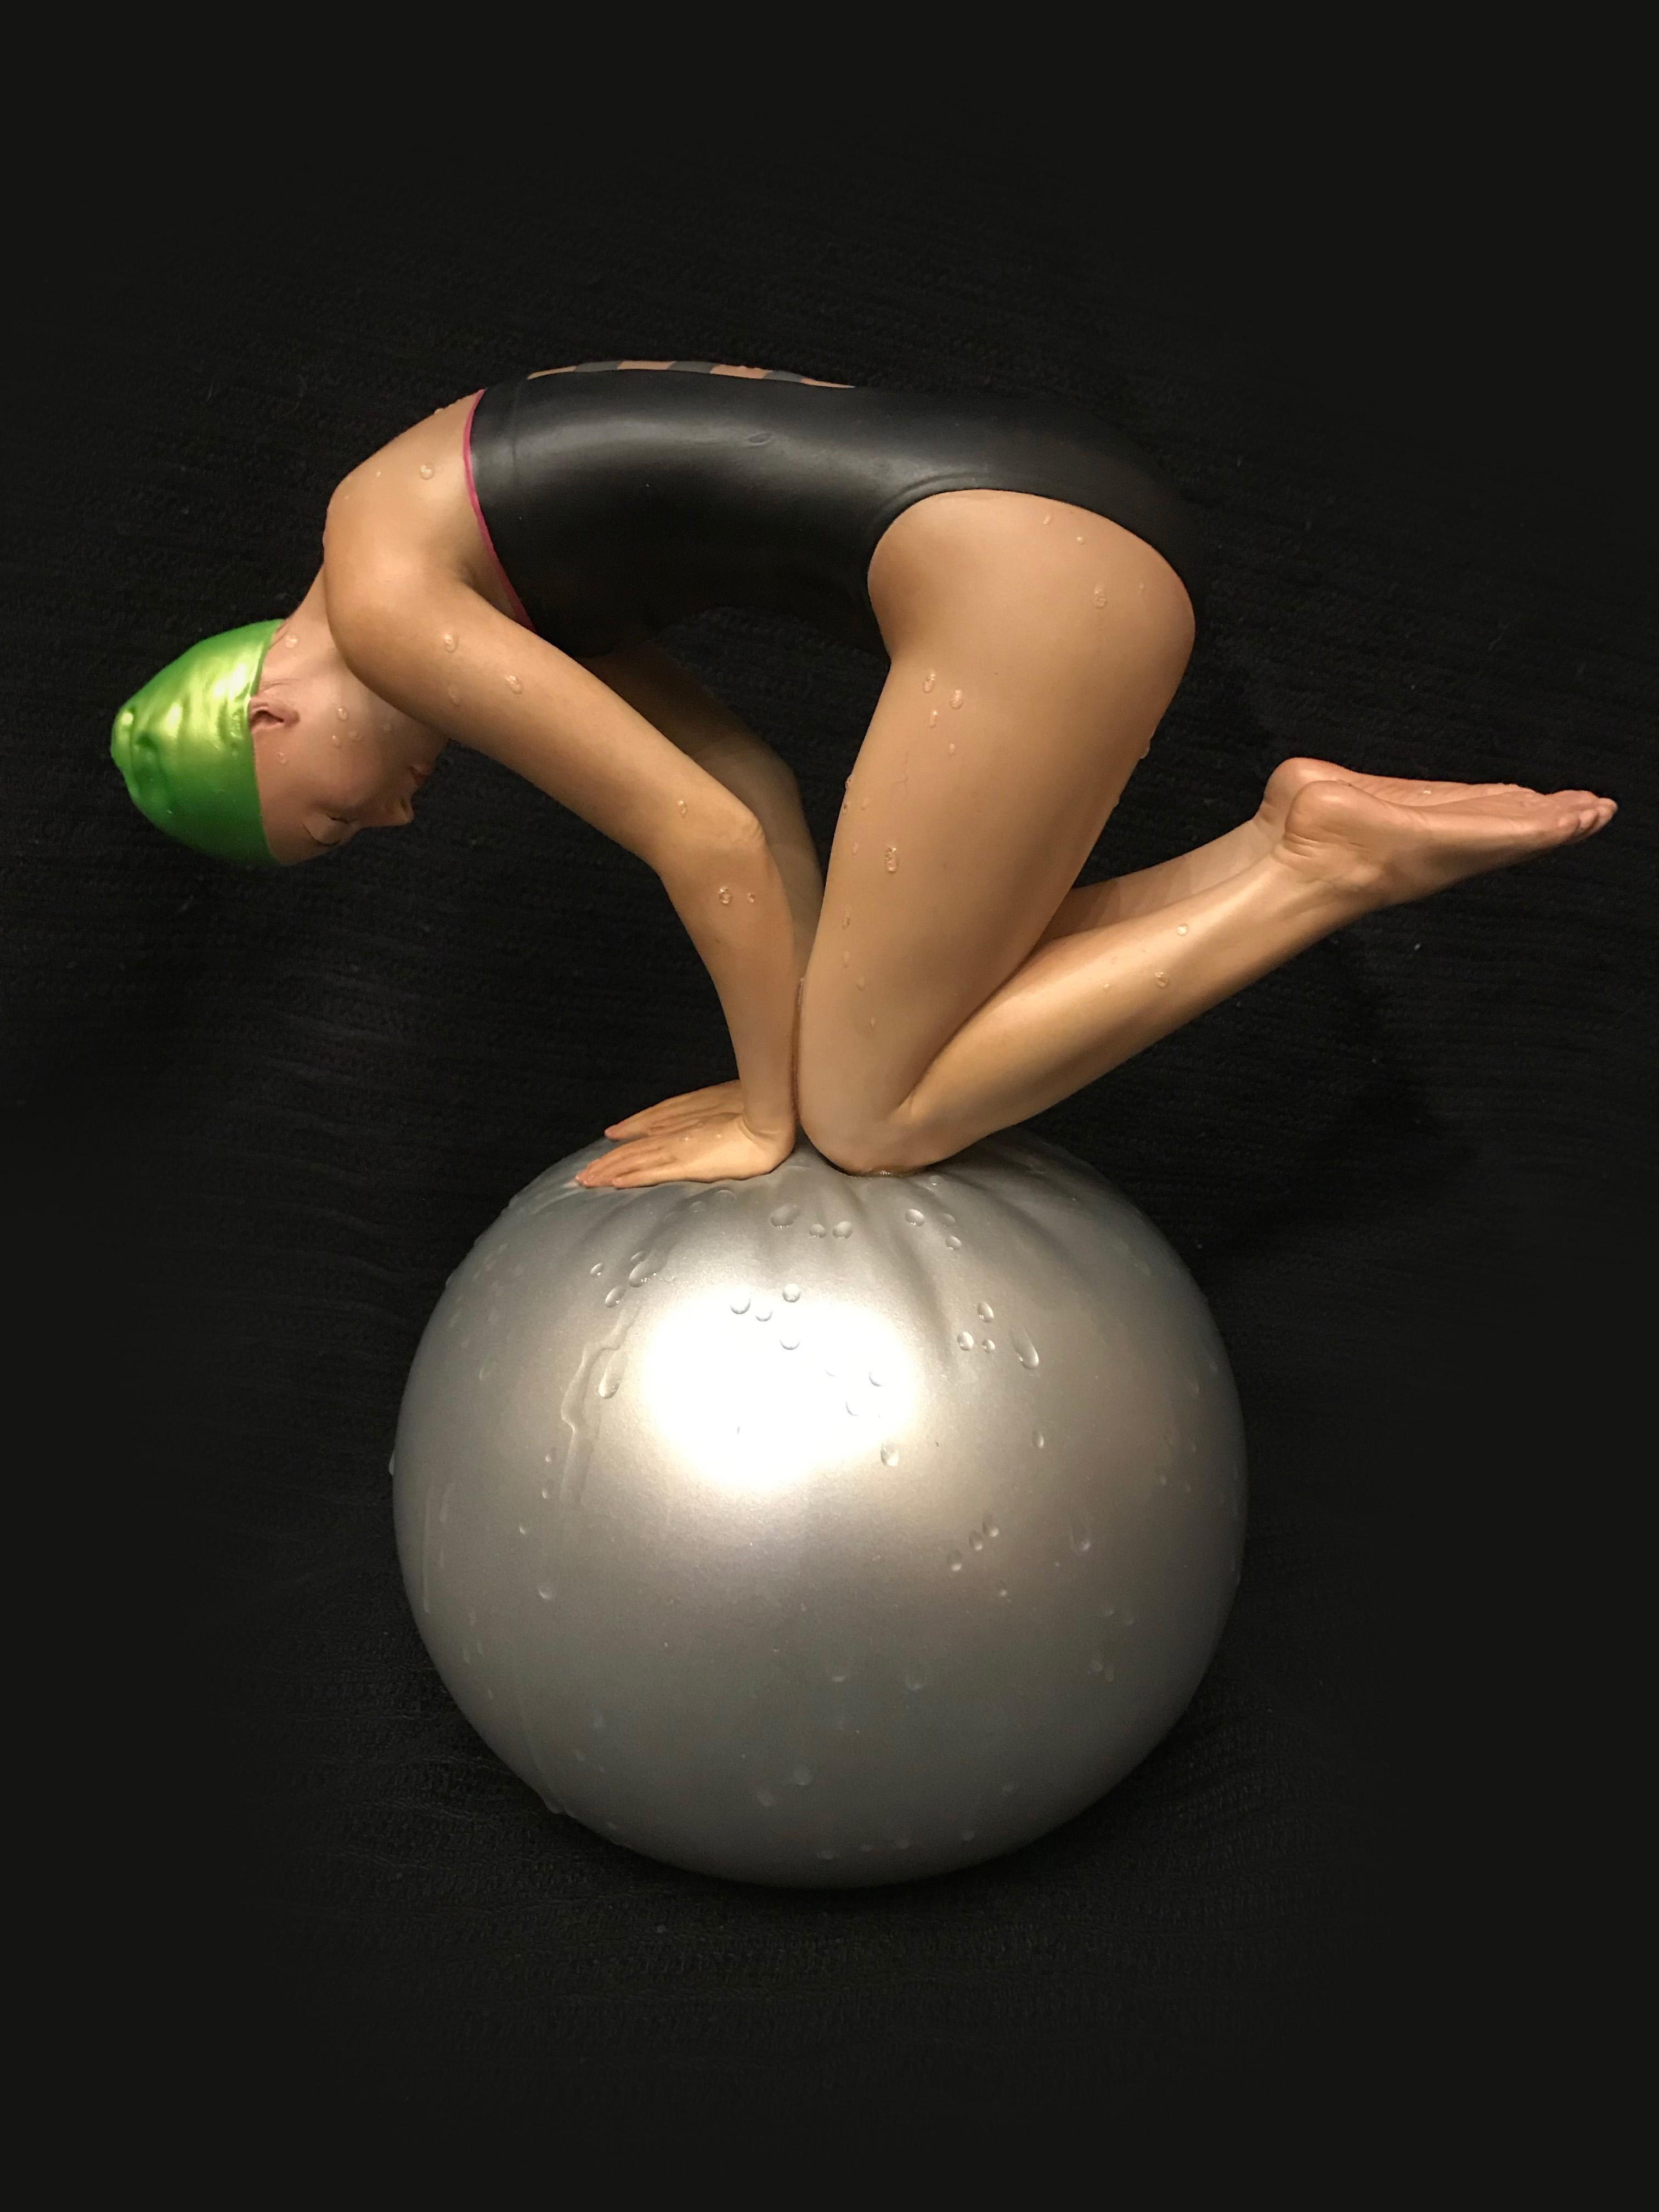 Miniature Quan, Swimmer Sculpture by Carole Feuerman